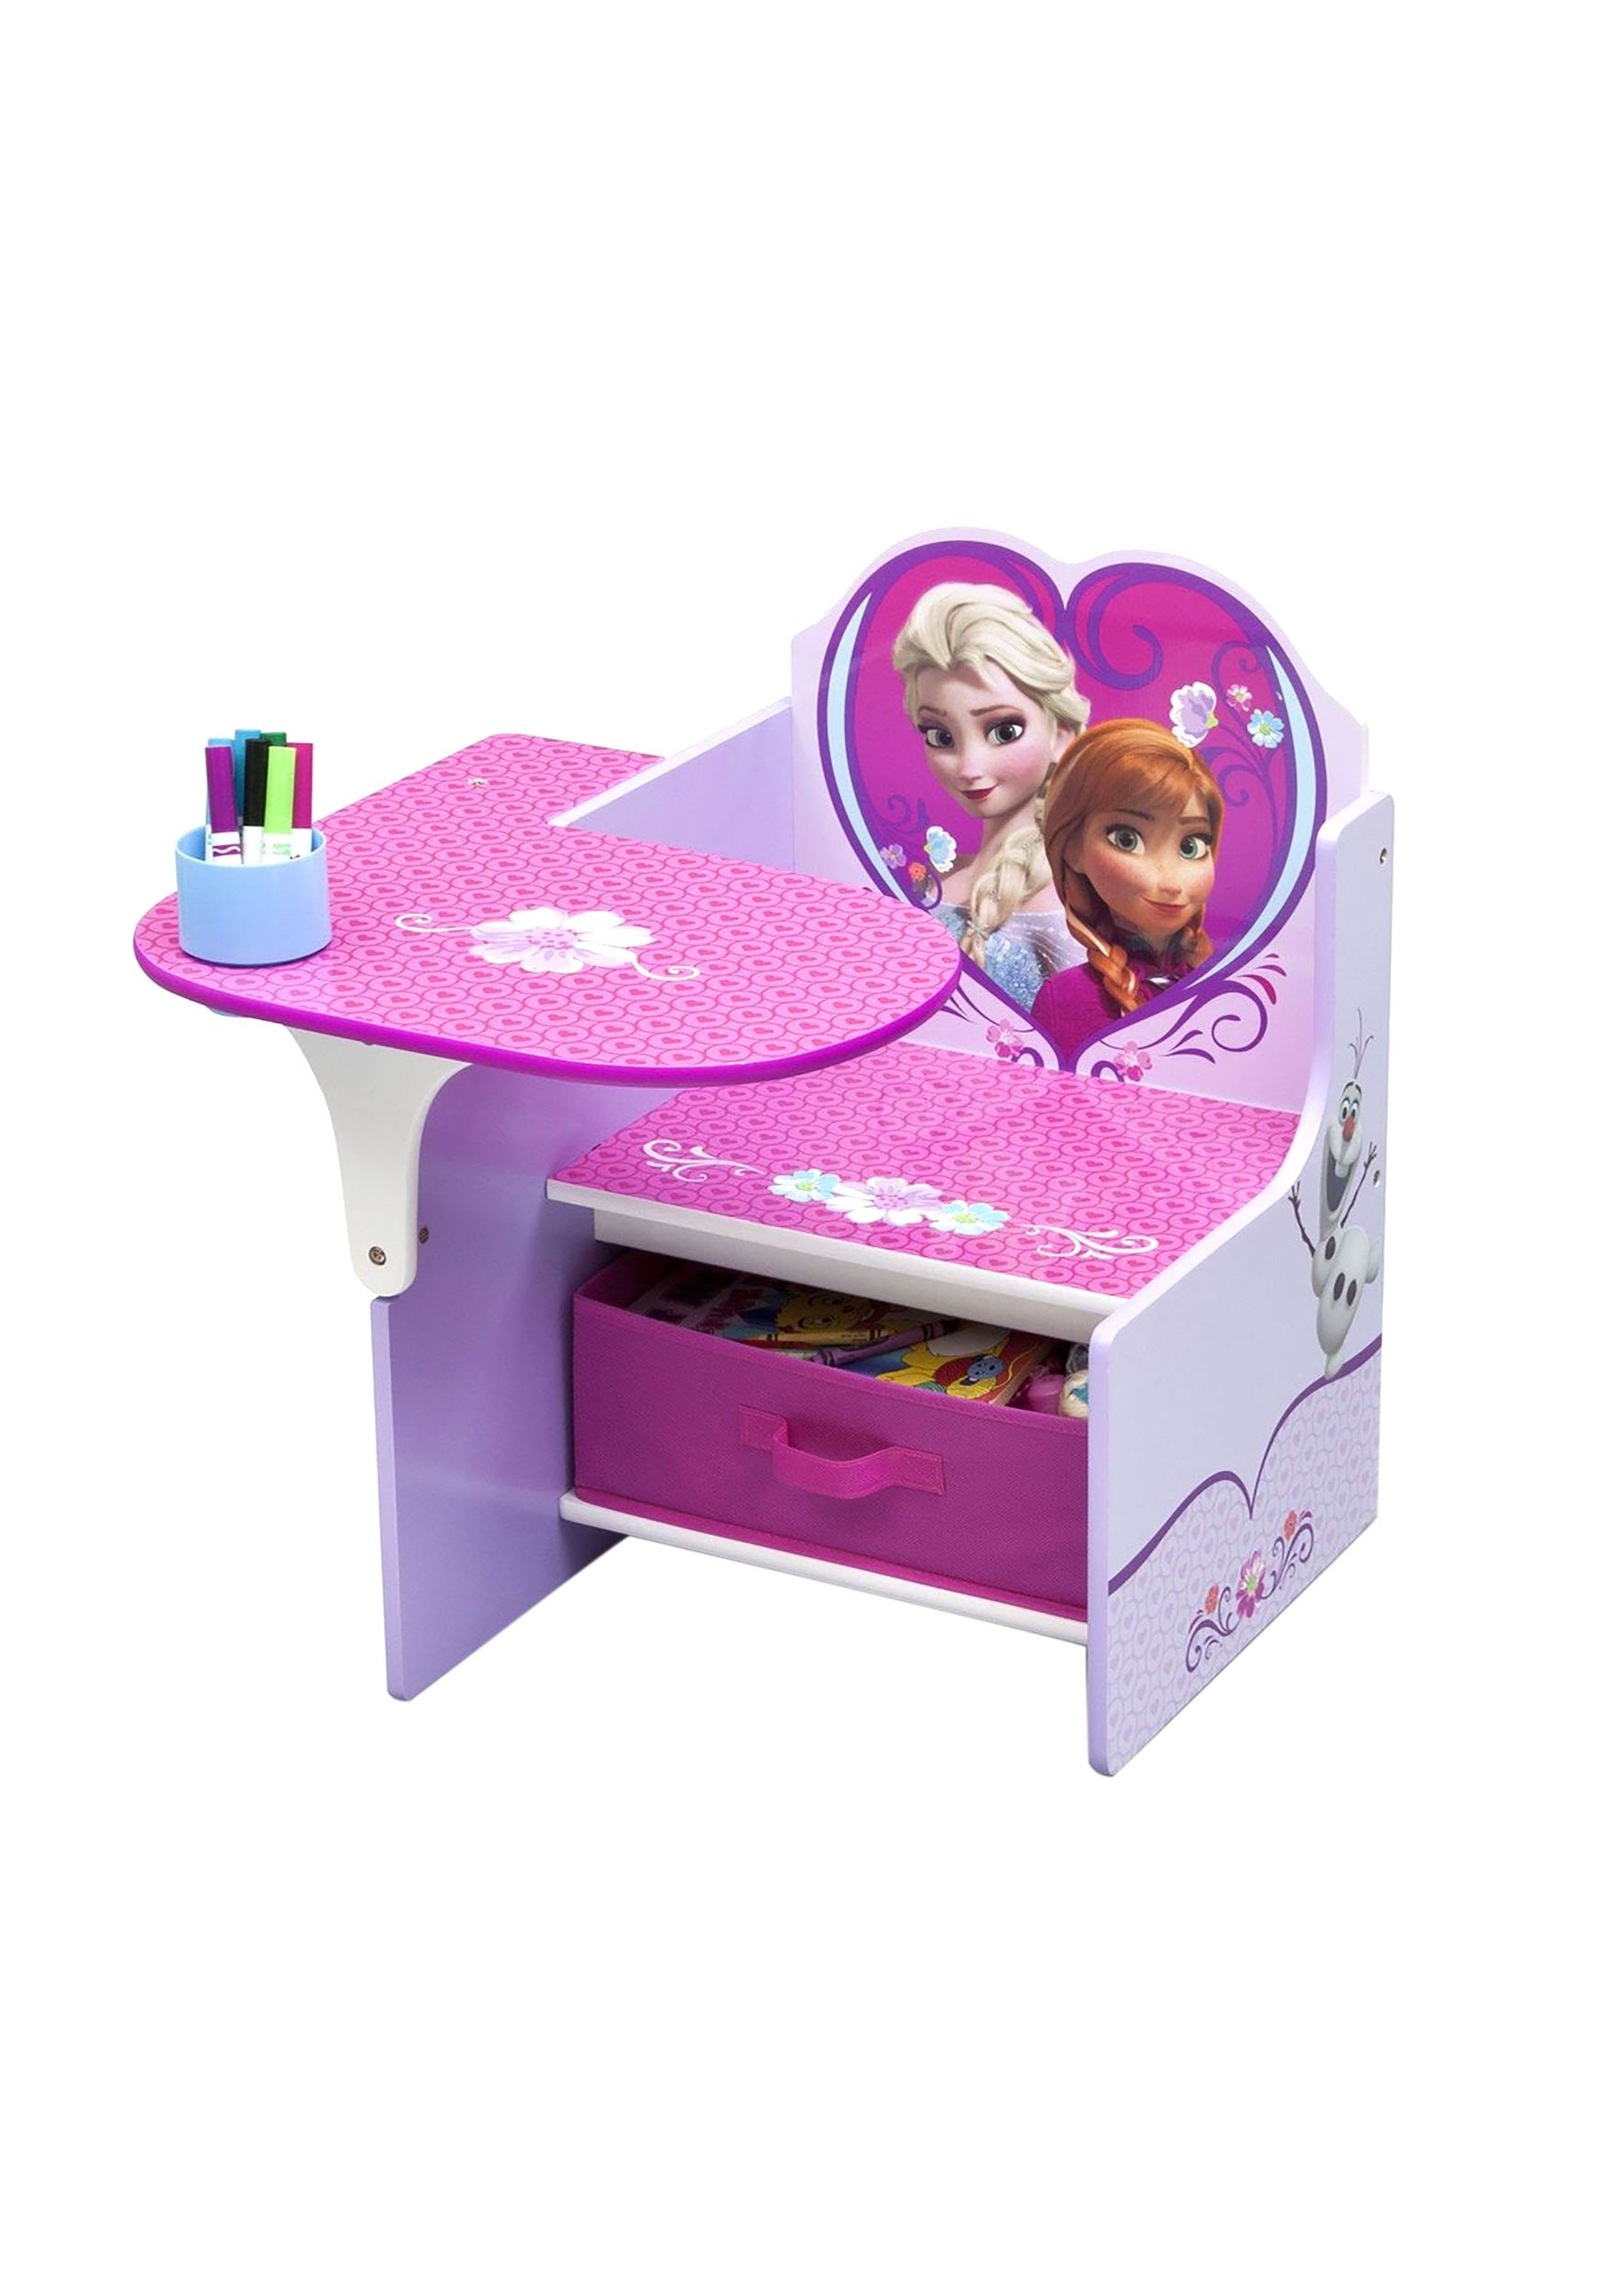 Enjoyable Frozen Chair Desk With Storage Bin Creativecarmelina Interior Chair Design Creativecarmelinacom